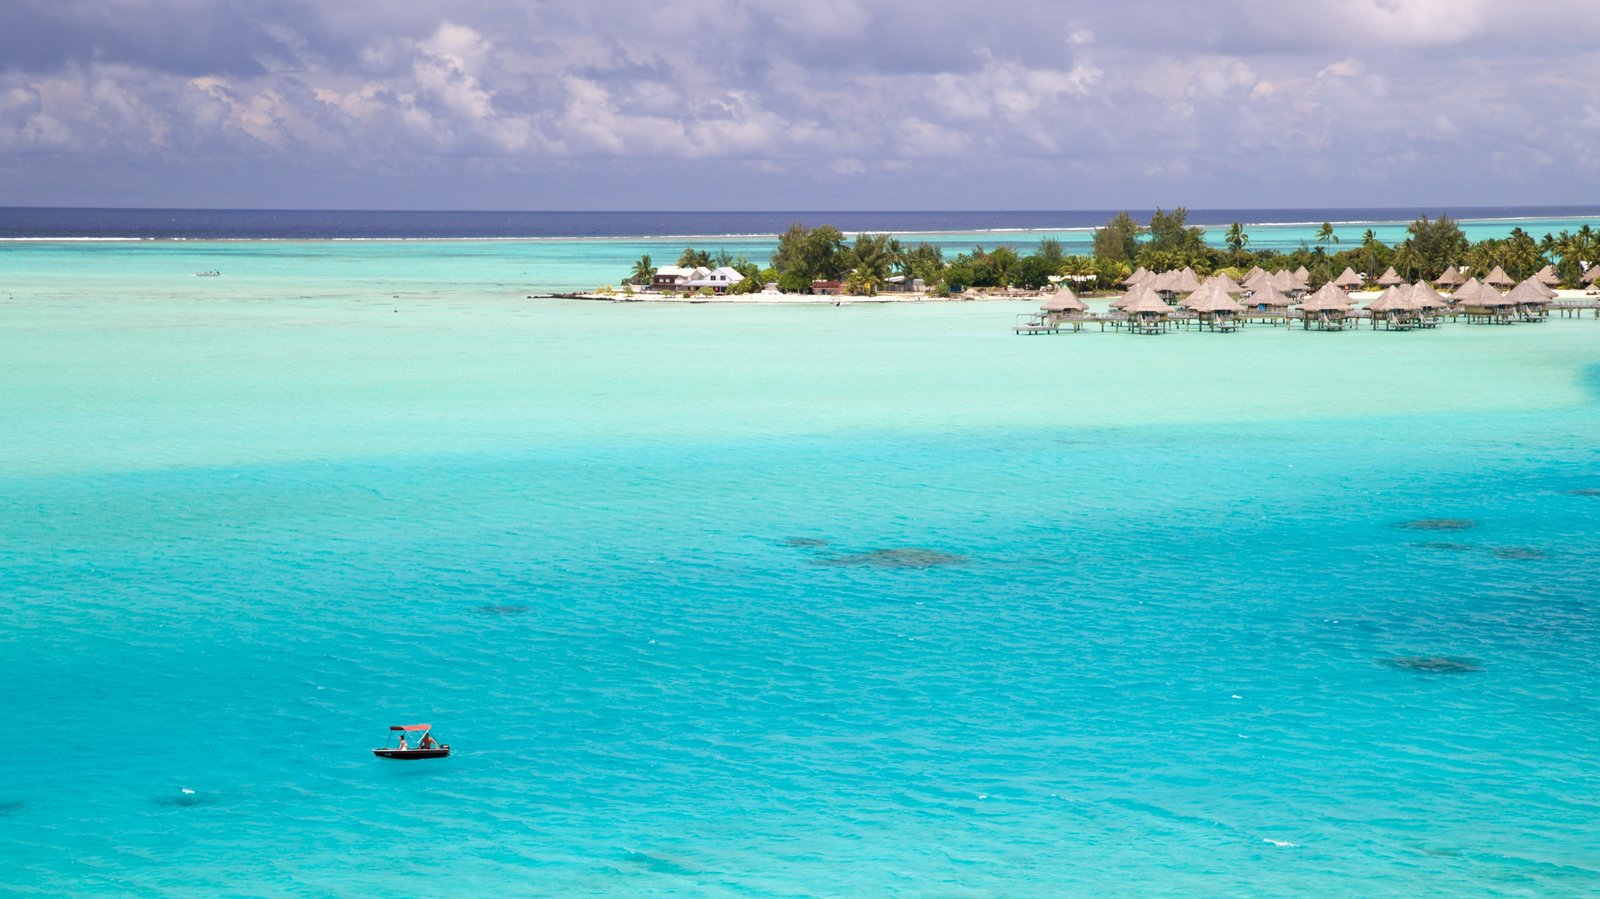 Bora Bora which includes general coastal views and tropical scenes